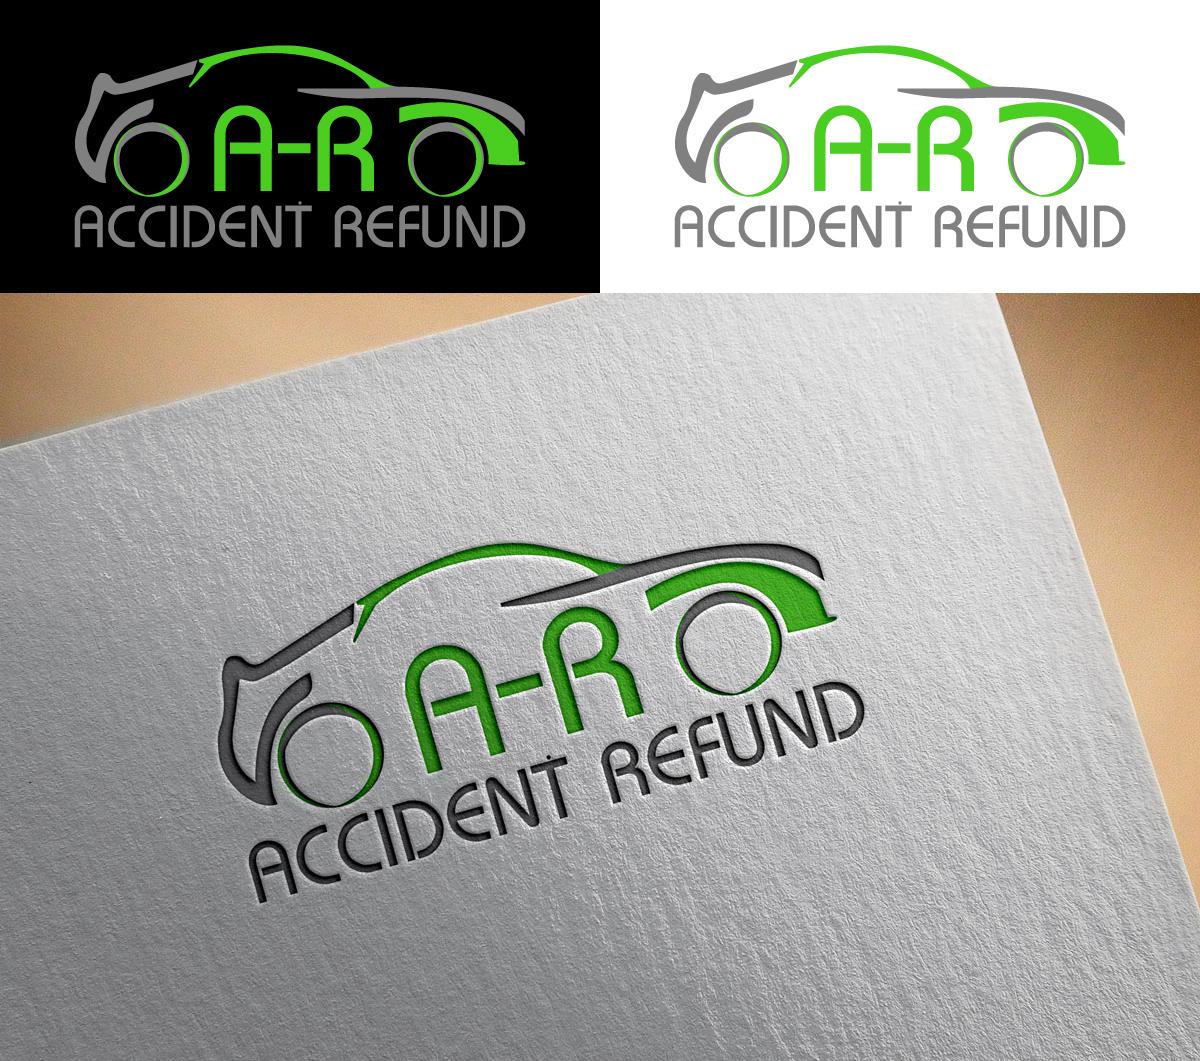 Professional, Serious, Automotive Logo Design for Accident